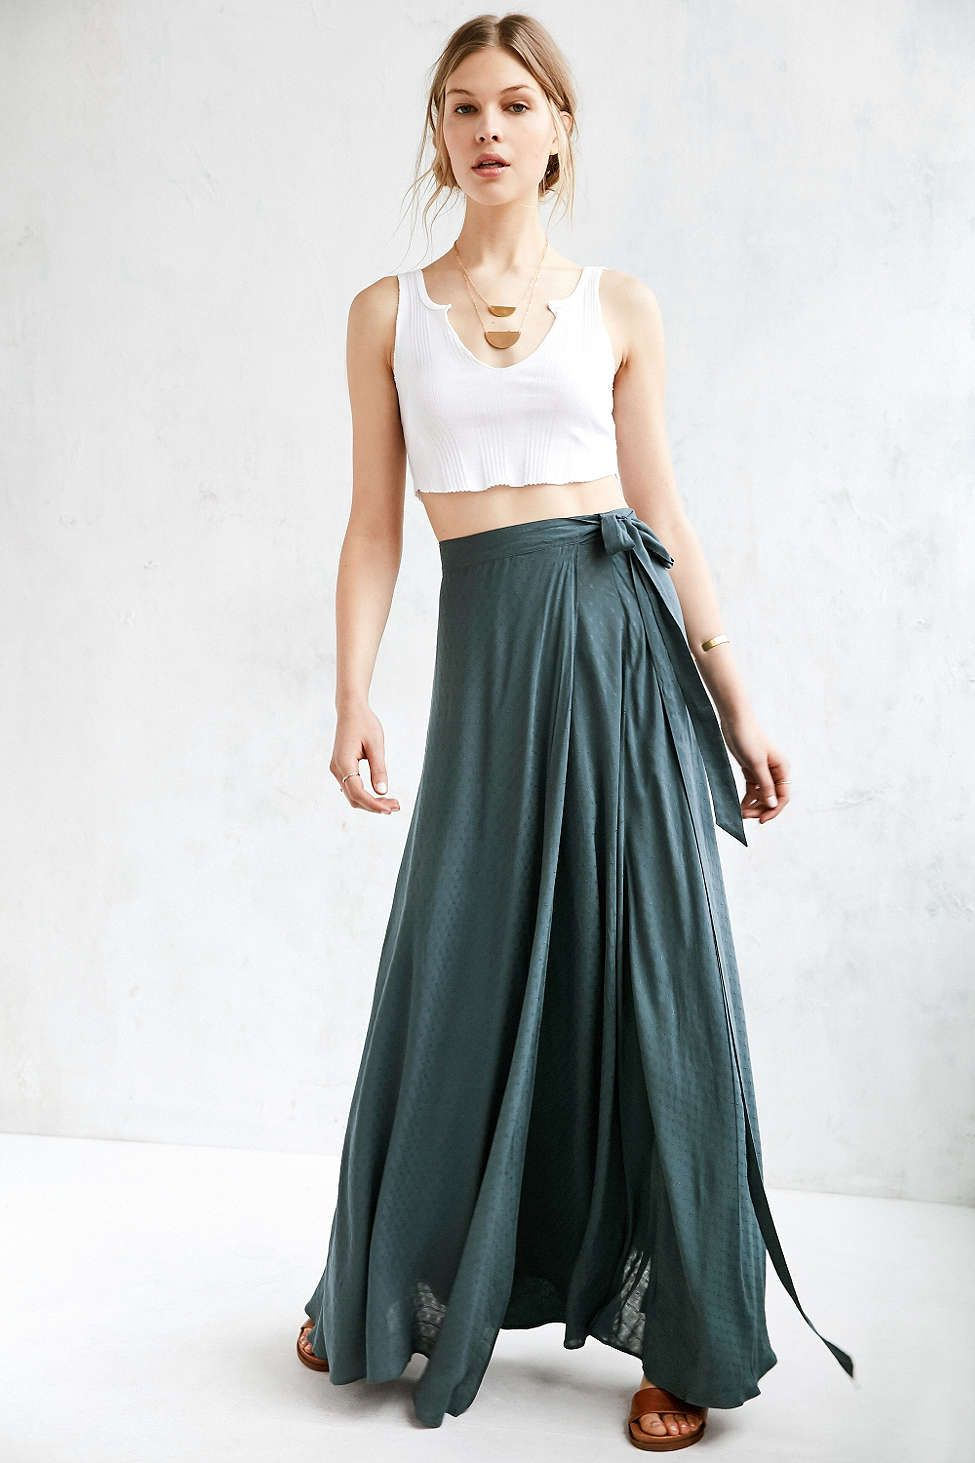 e6f18423a39c Ecote Zella Boho Wrap Maxi Skirt   I'd definitely wear that...or ...